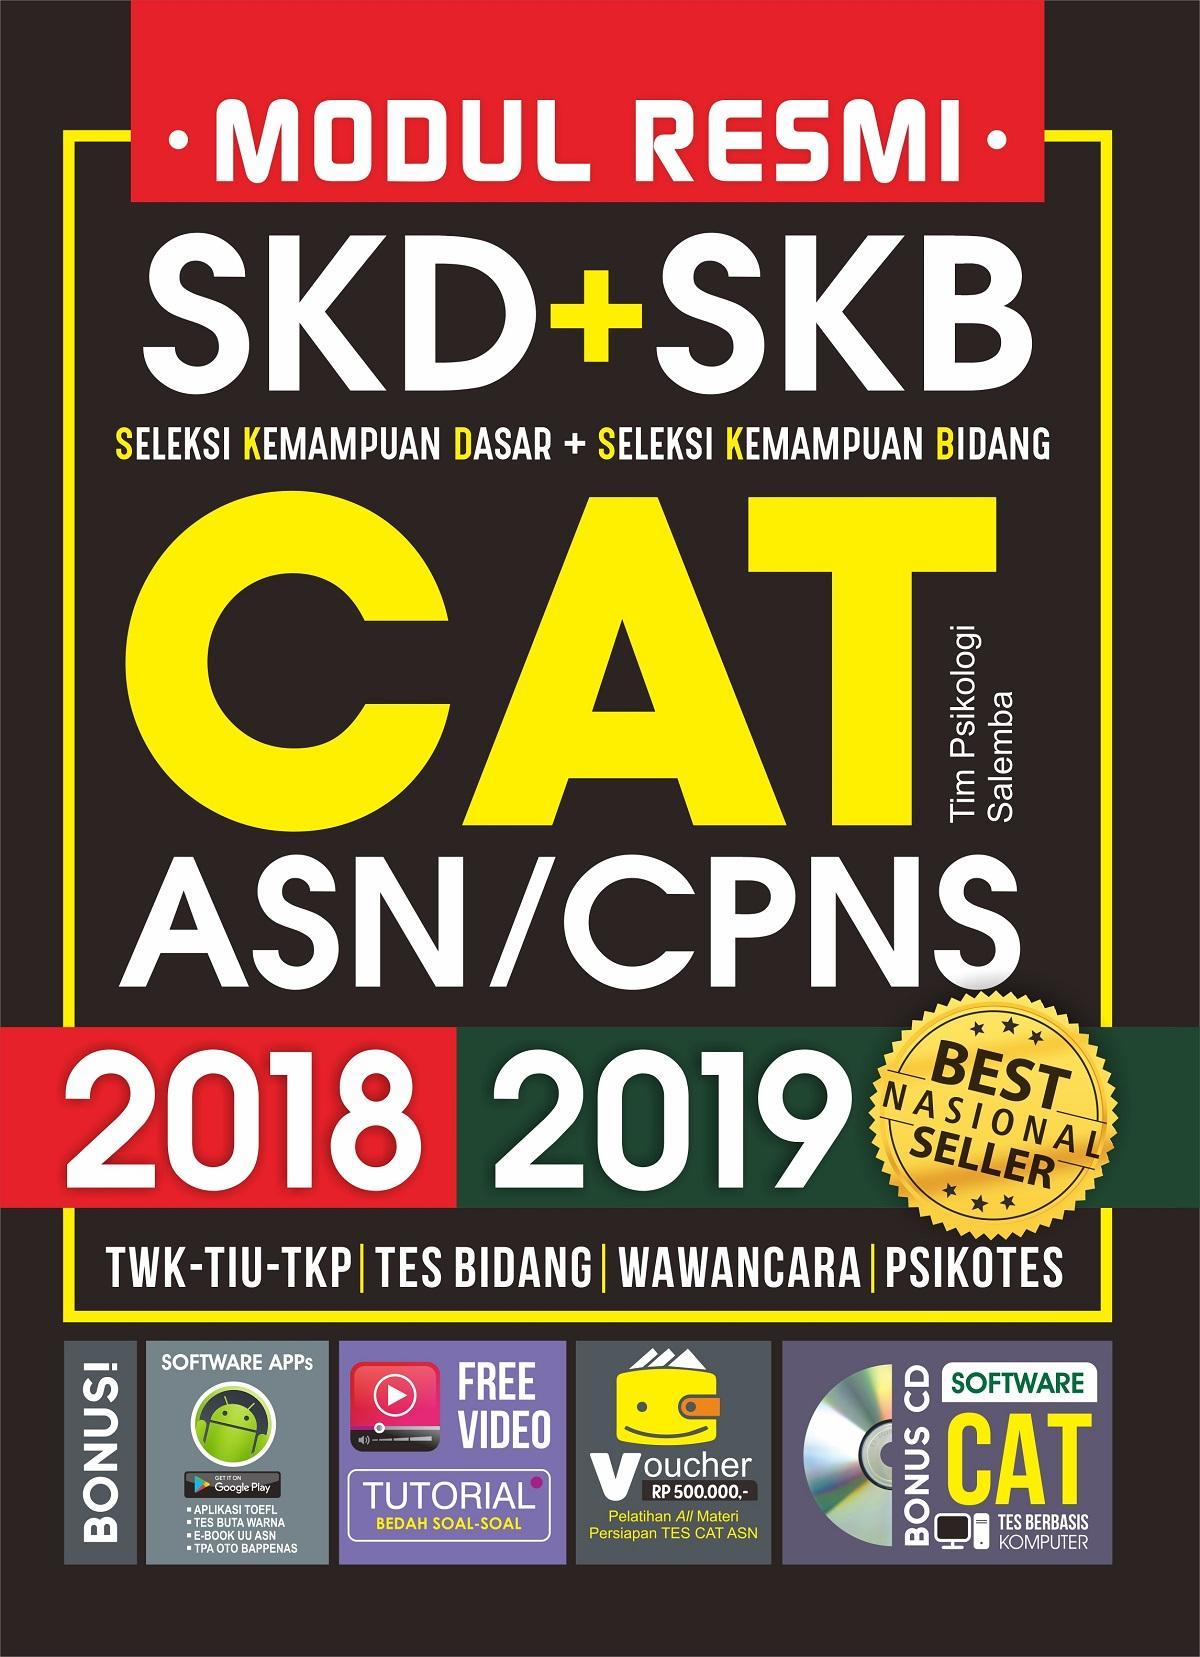 MODUL RESMI SKD+SKB CAT ASN/CPNS